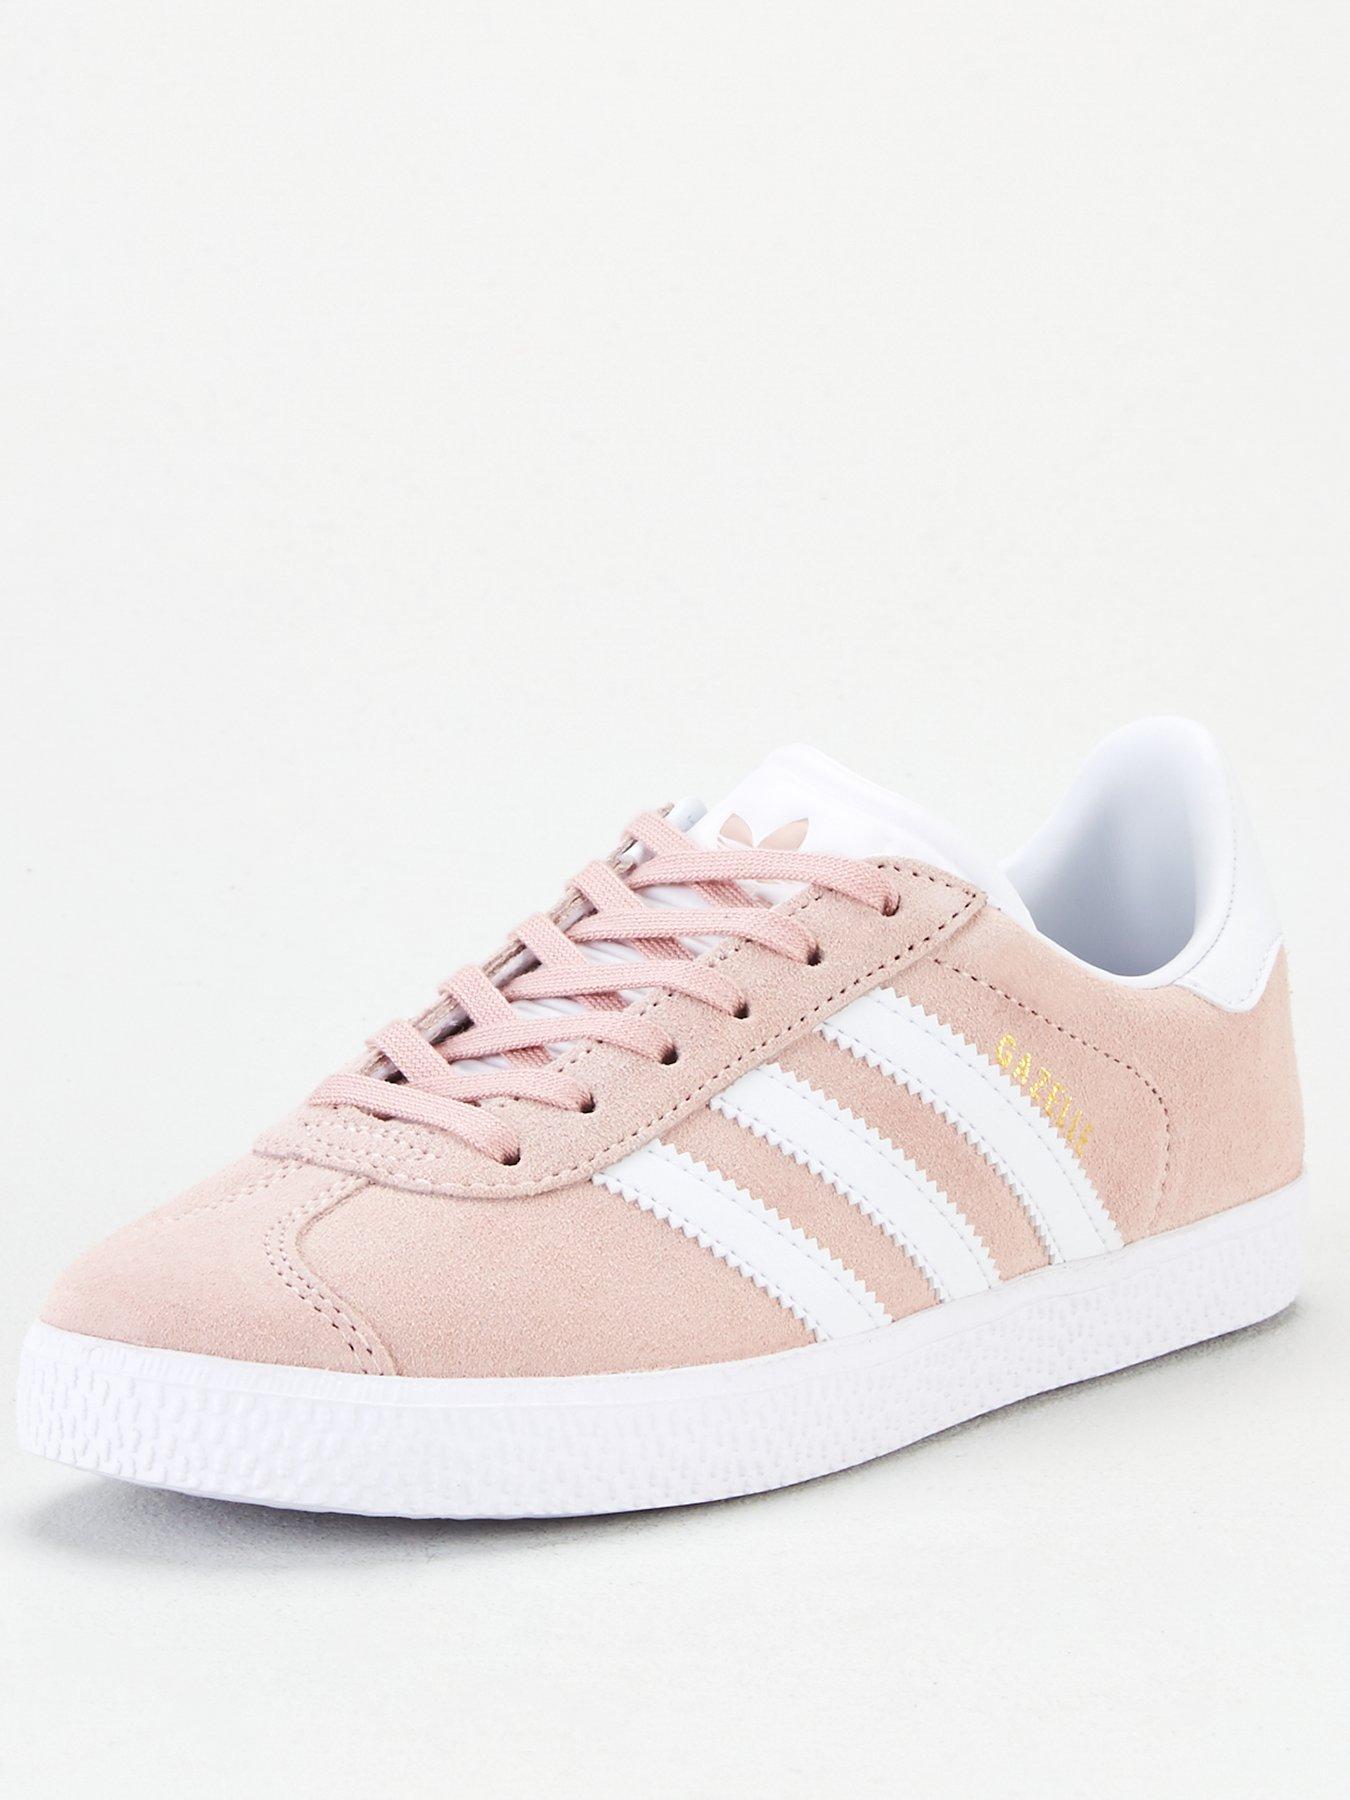 Pink | Adidas | Junior footwear (sizes 3-6) | Trainers | Child ...